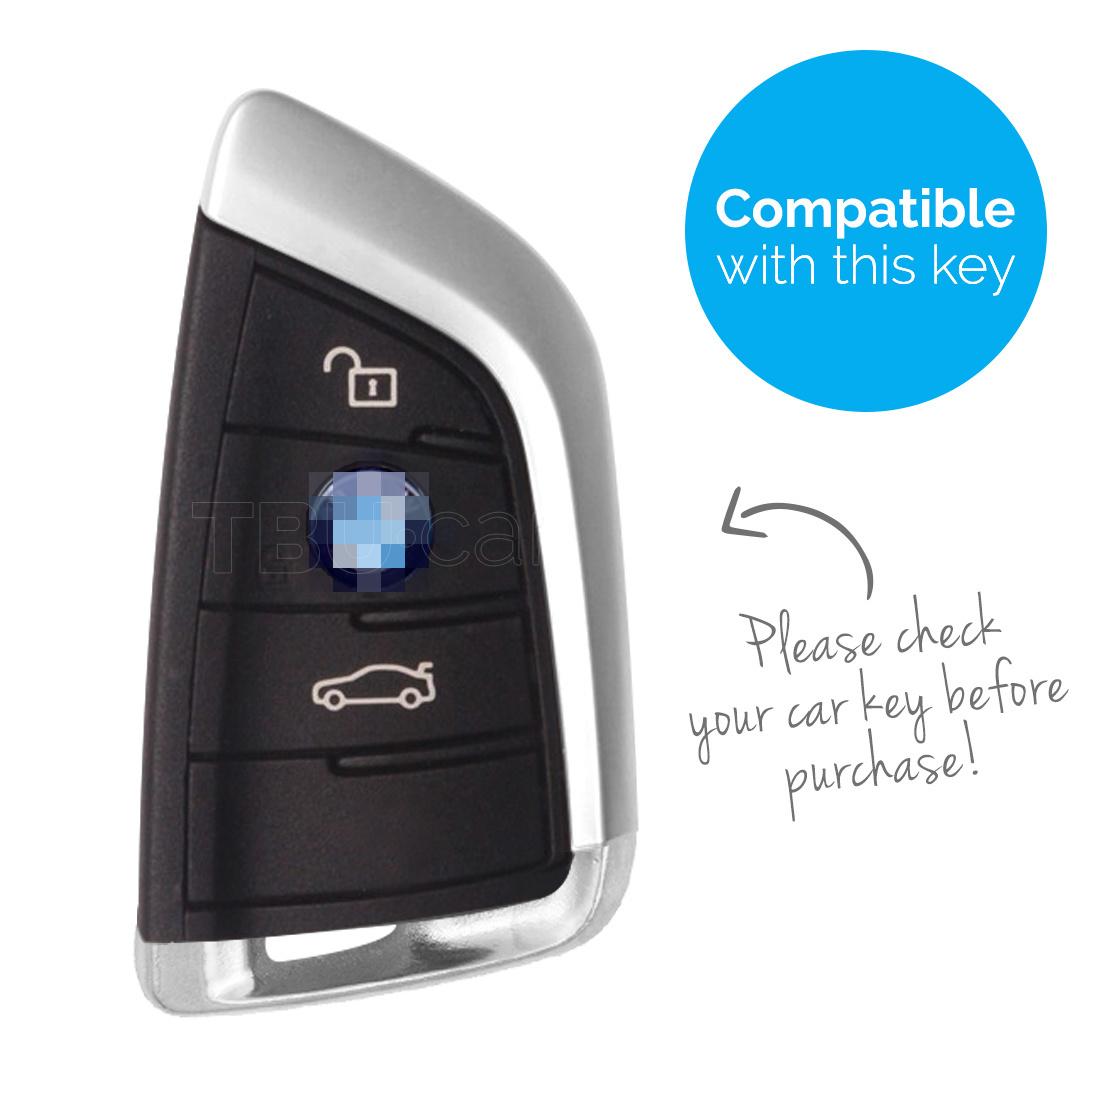 TBU car TBU car Autoschlüssel Hülle kompatibel mit BMW 3 Tasten (Keyless Entry) - Schutzhülle aus Silikon - Auto Schlüsselhülle Cover in Rott